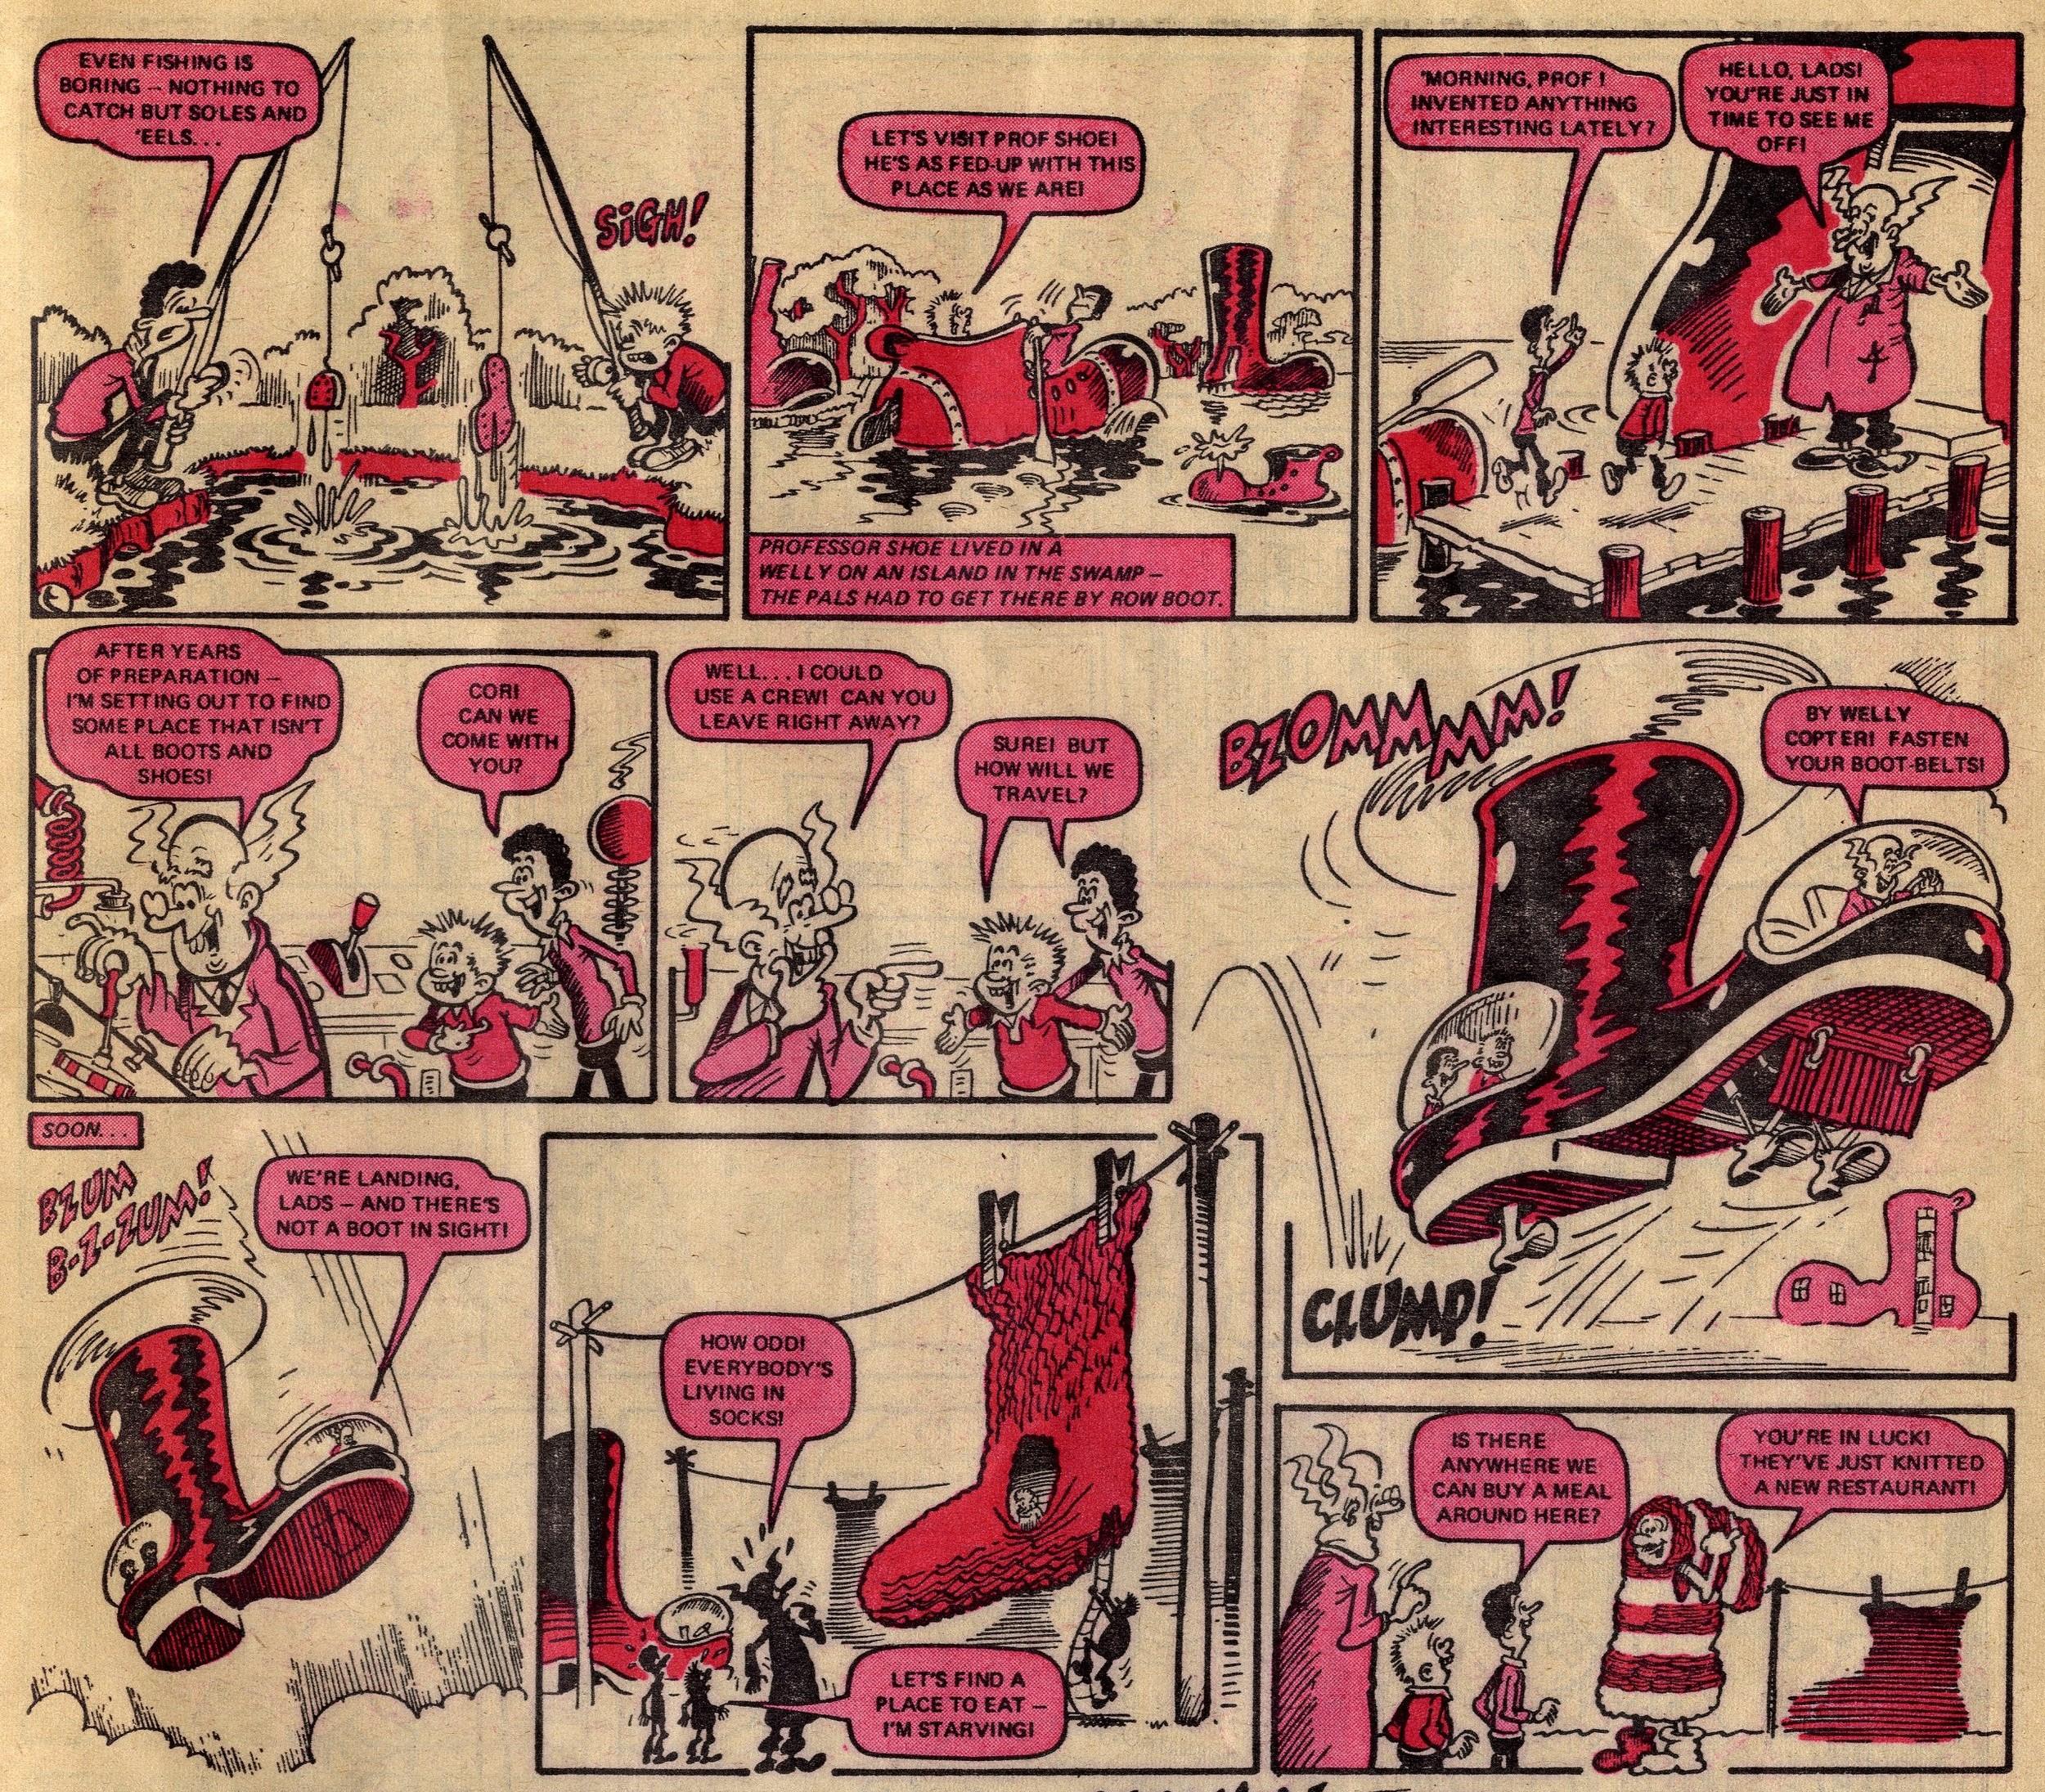 Terry and Gavin's Funtastic Journey: Ian Knox (artist)